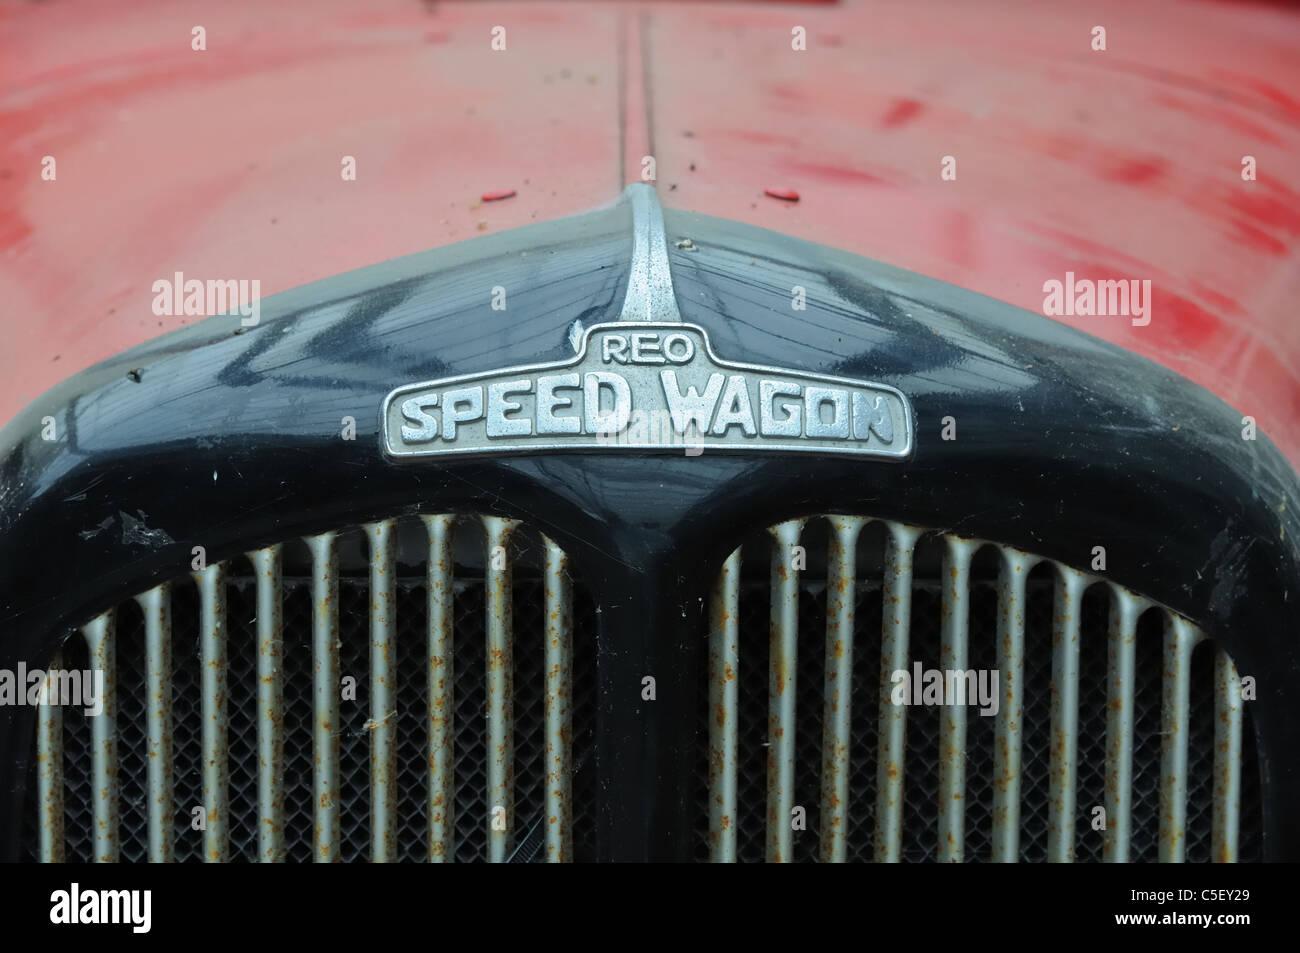 Reo Automobile Stock Photos & Reo Automobile Stock Images - Alamy